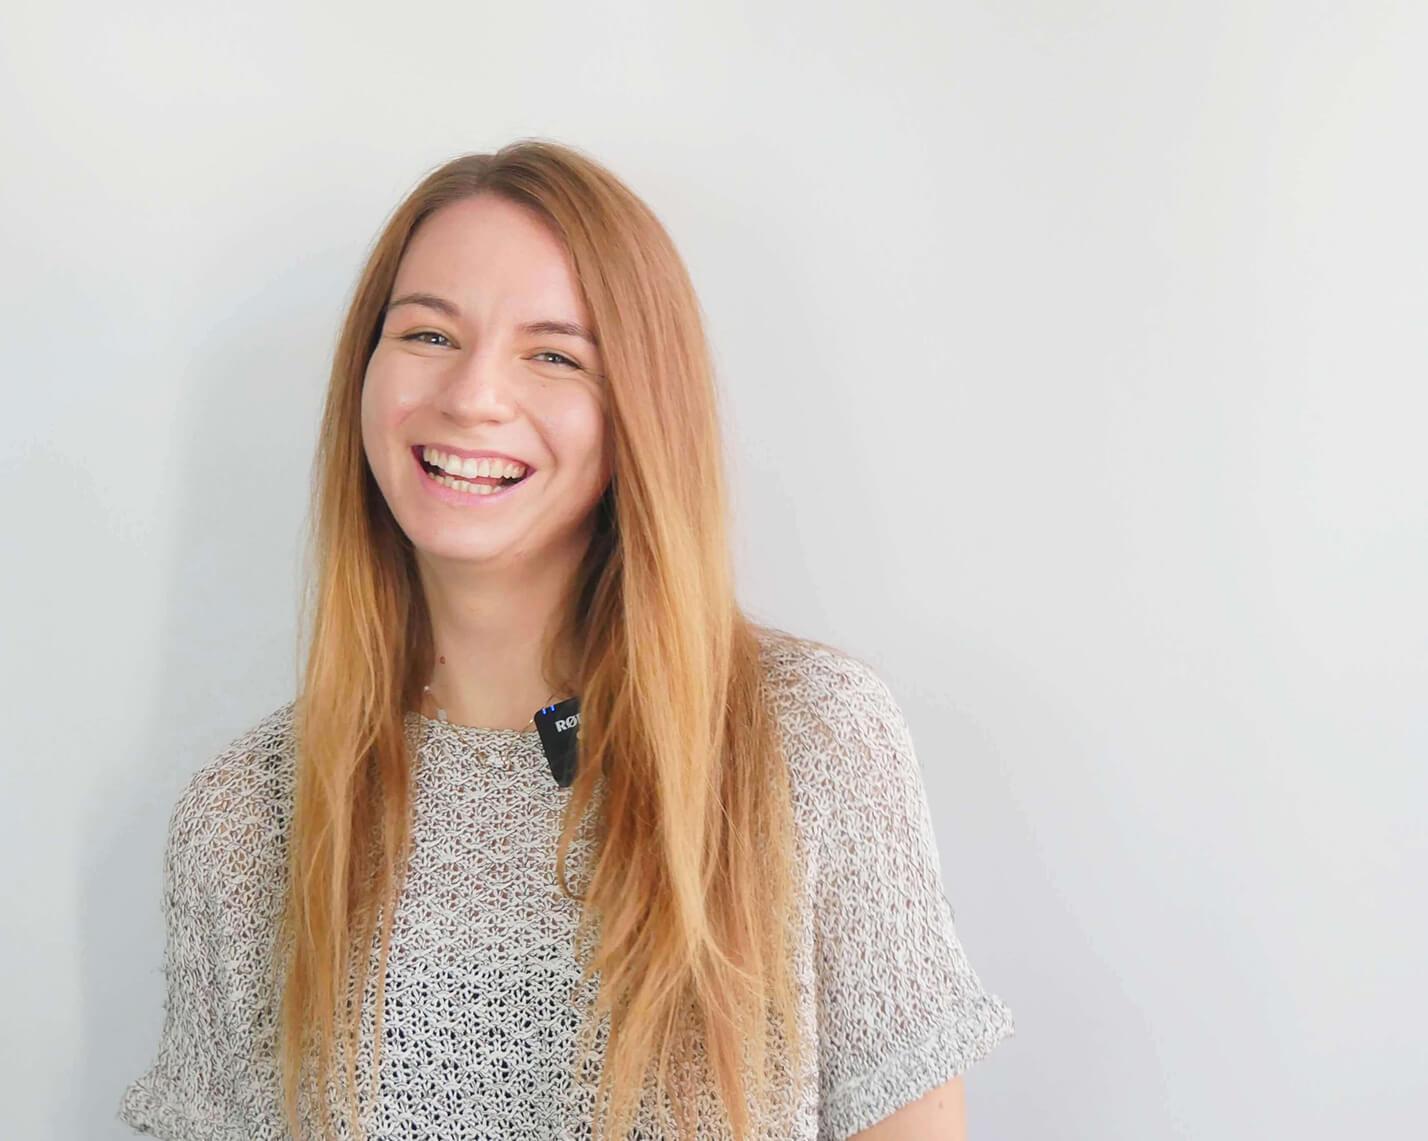 Intervista Girls Tech Giulia Bassani